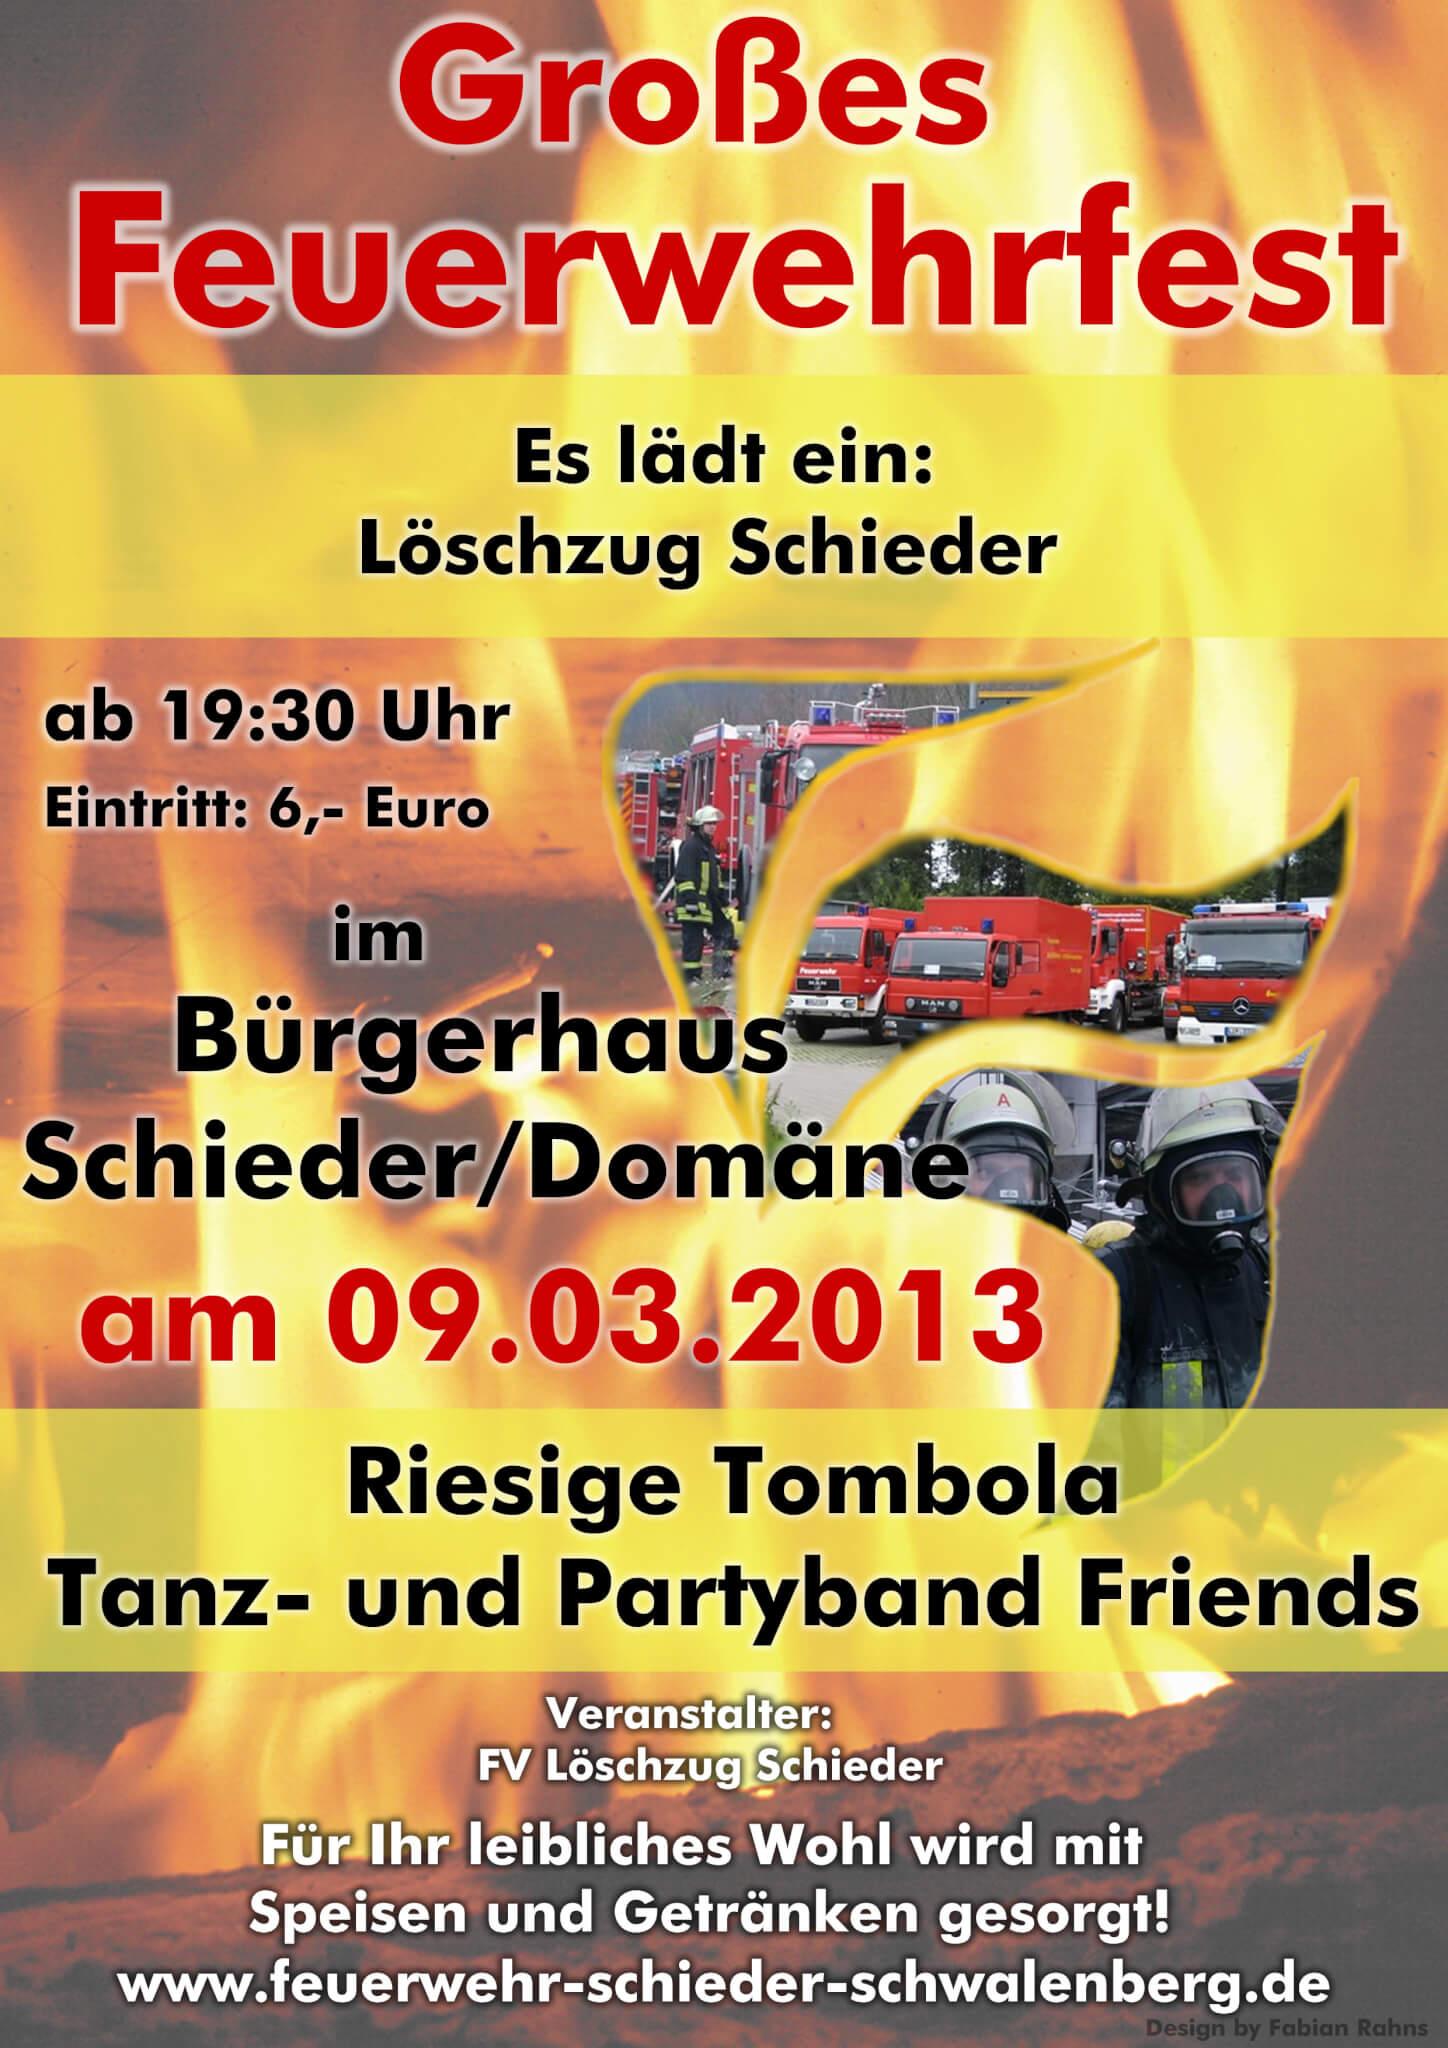 feuerwehrfest01_rahns